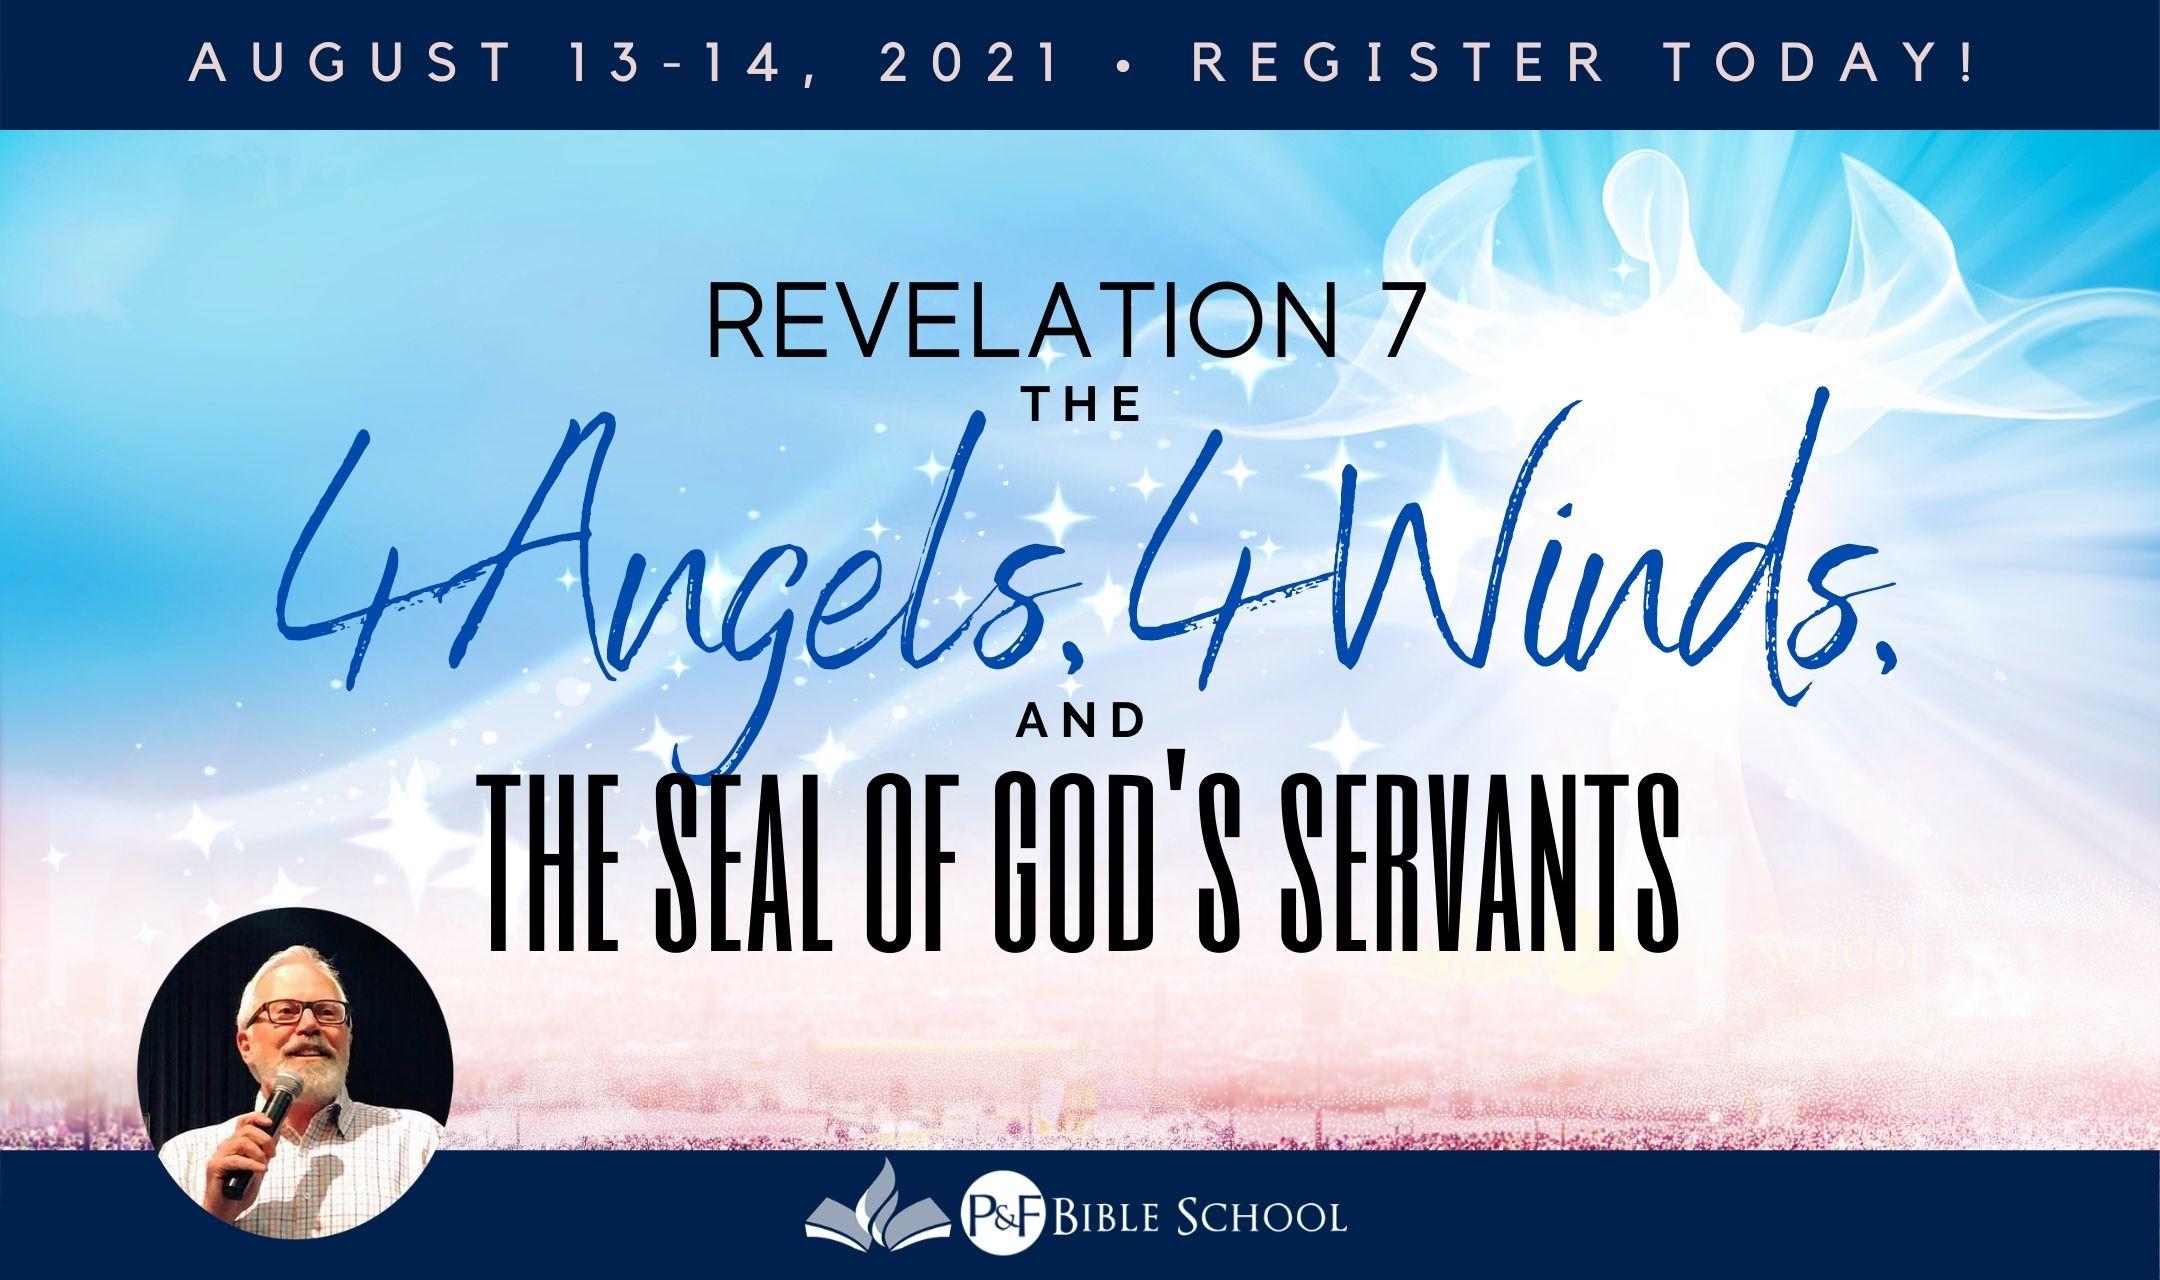 Wichita, KS—P&F Bible School—Rev 7: Four Angels, Four Winds, & the Seal of God's Servants